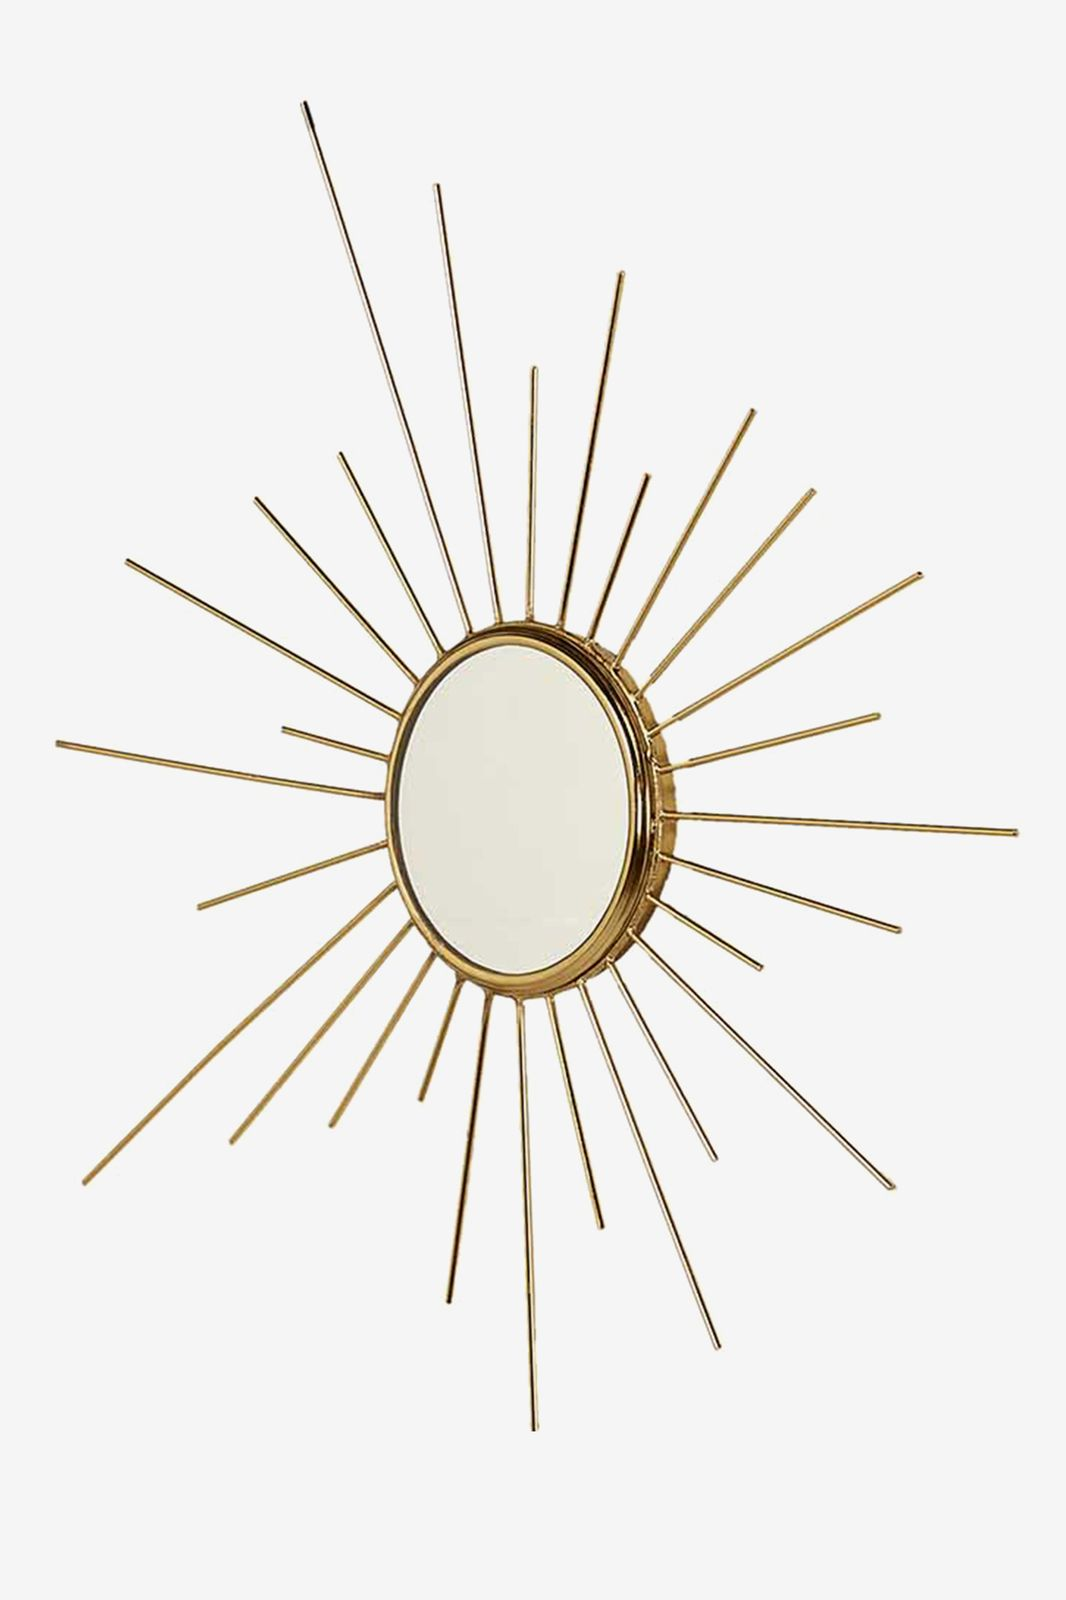 Bronskleurige Spiegel zon - Homeland   Sissy-Boy